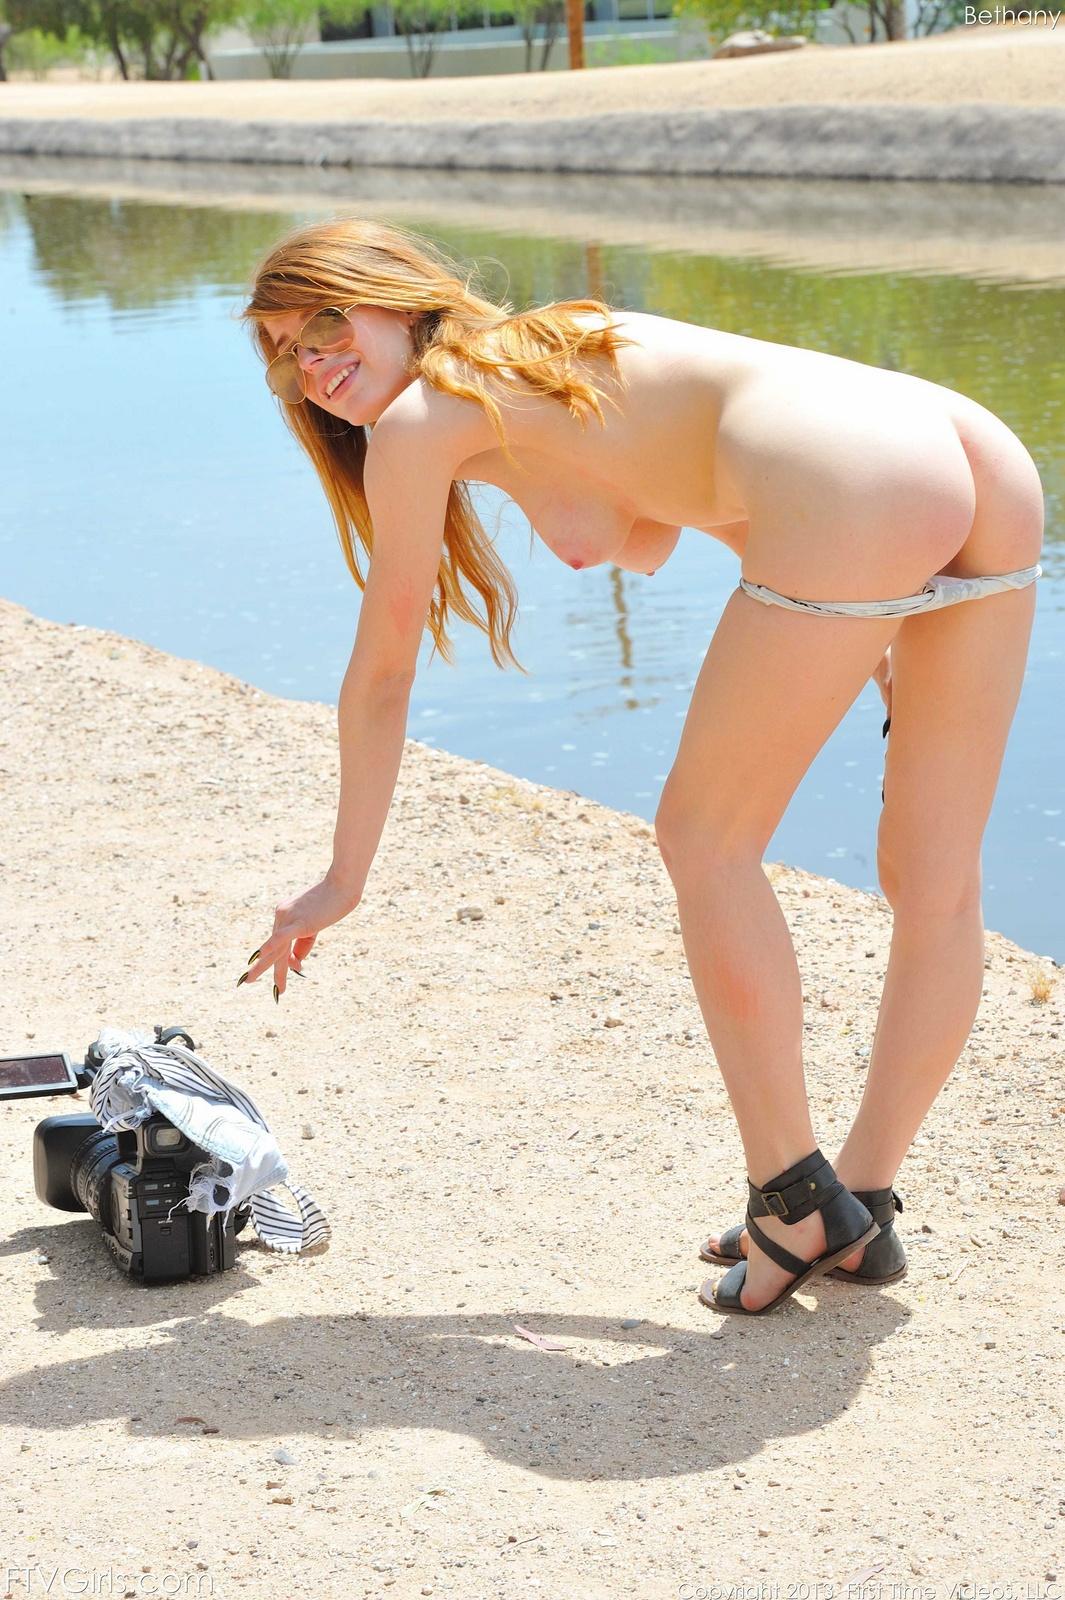 bethanie-skye-jeans-shorts-nude-ftvgirls-26